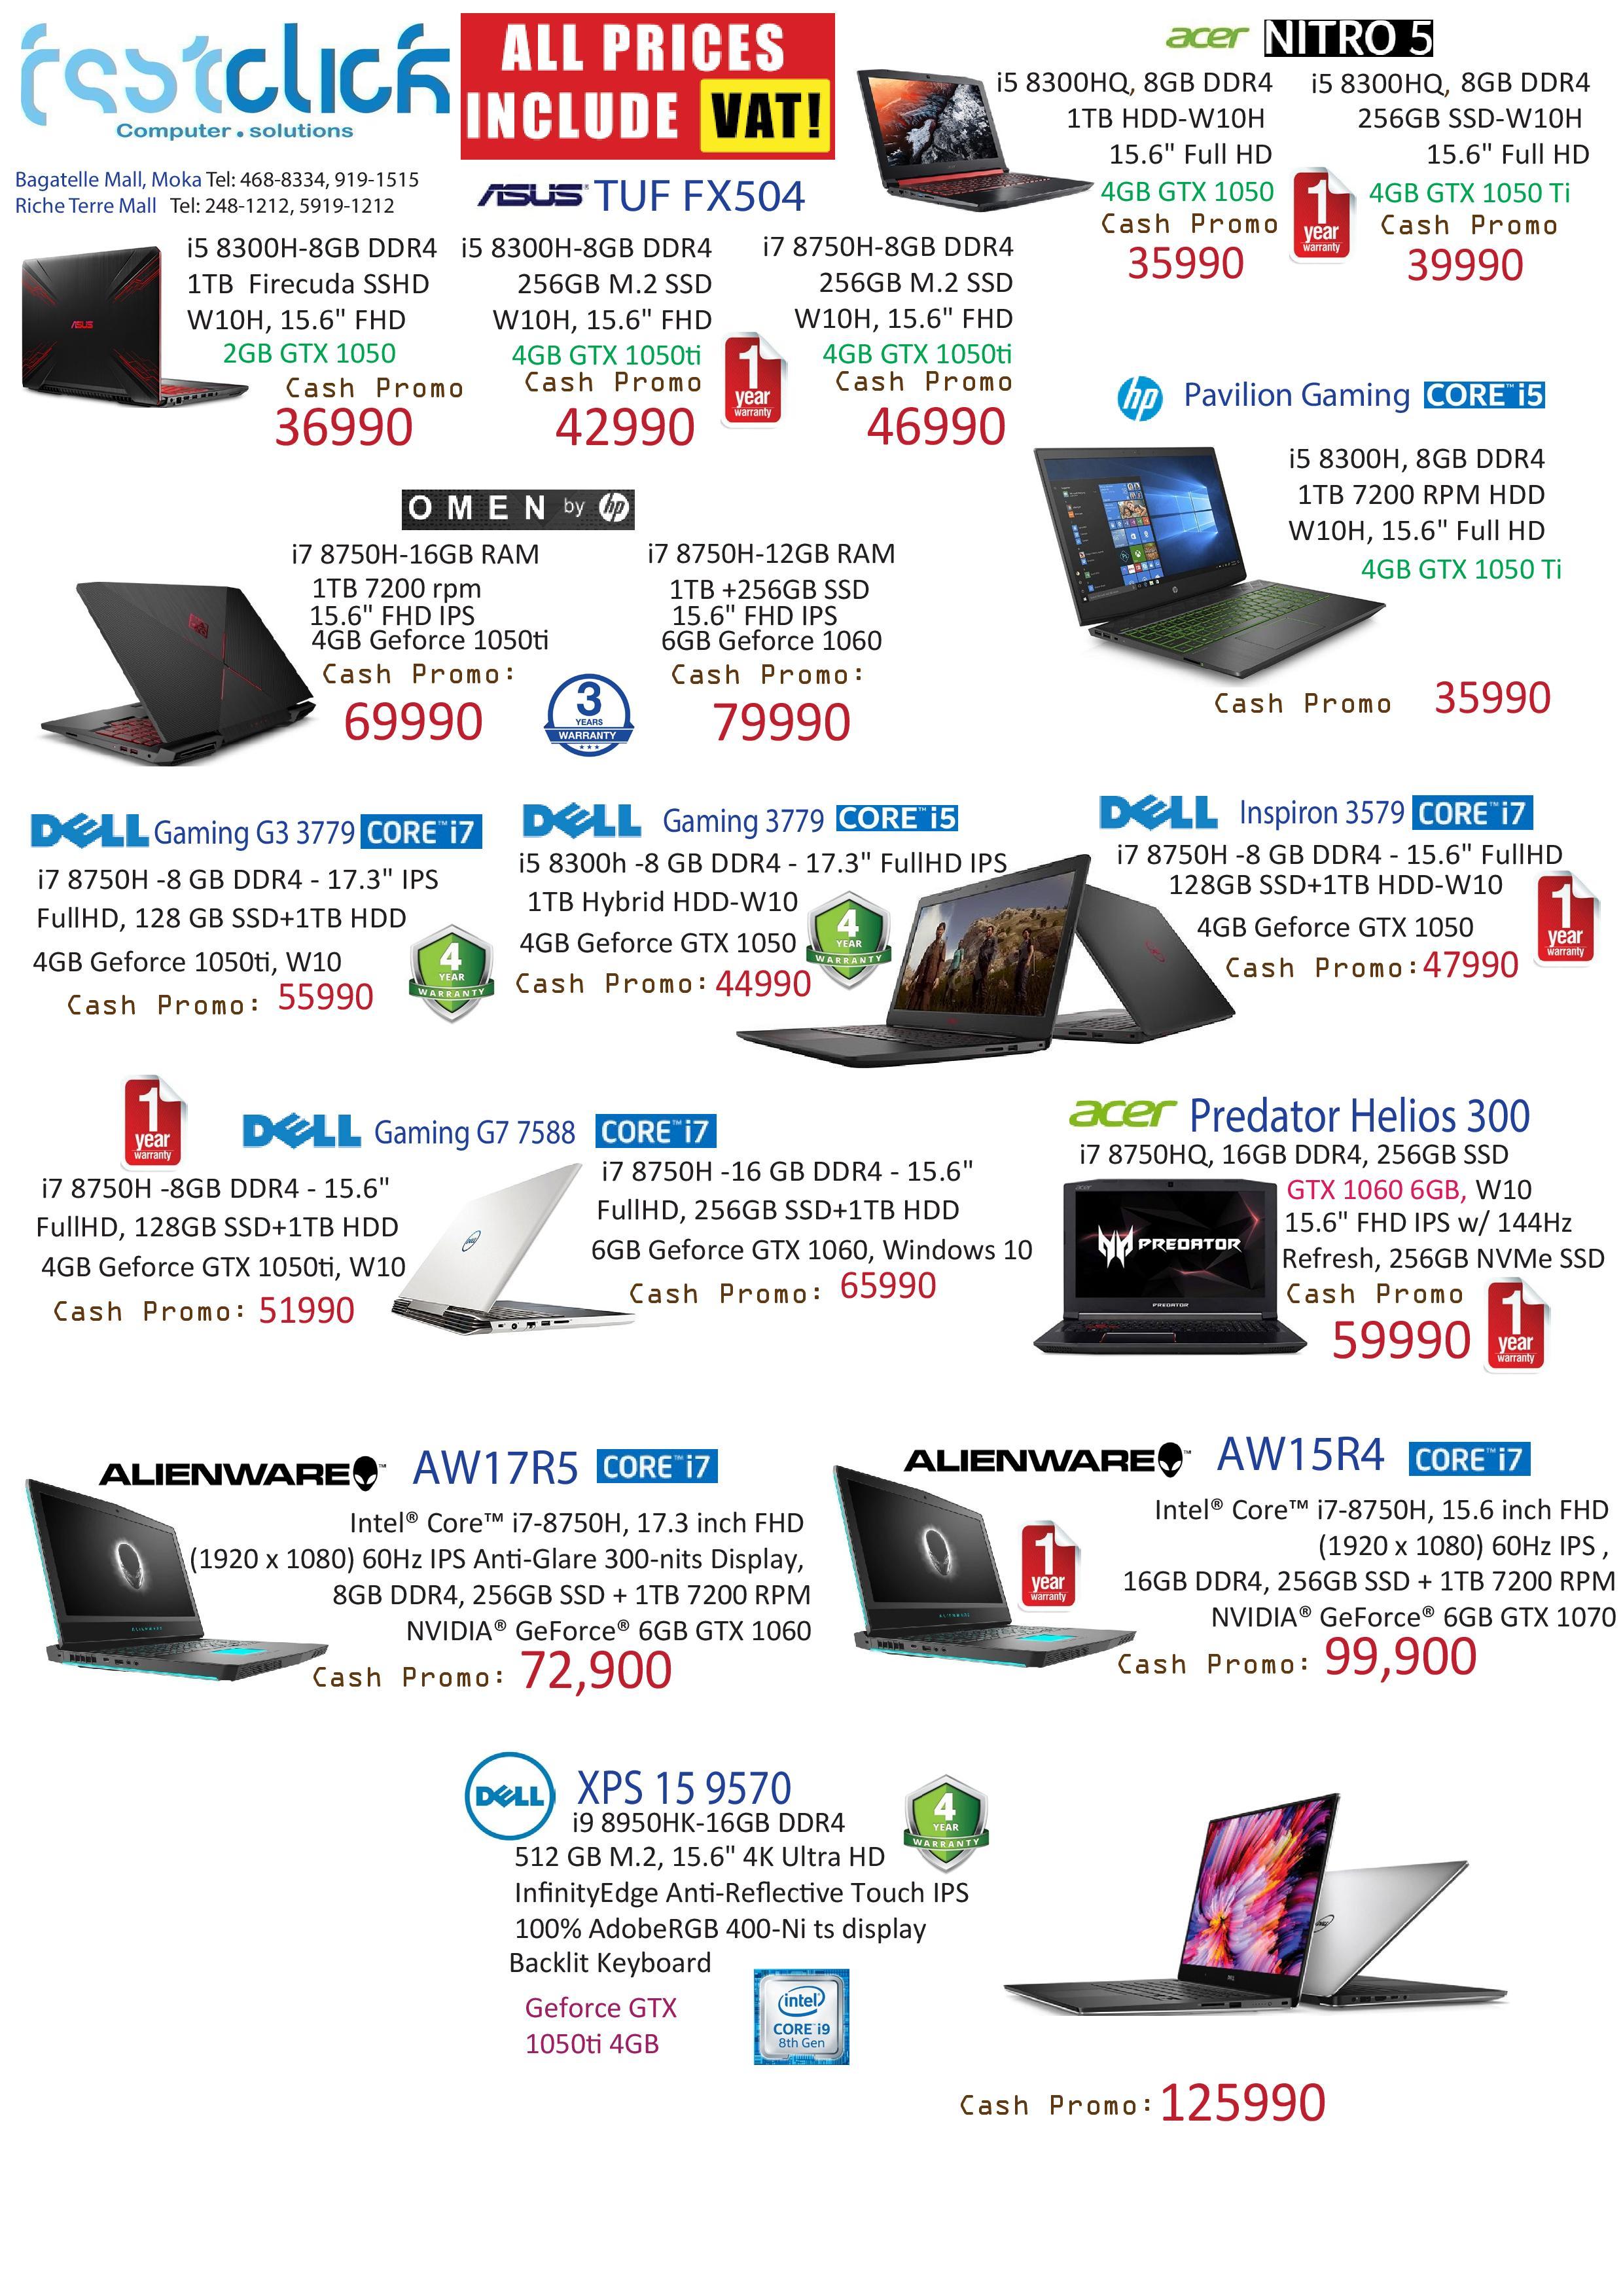 page-4-gaming-laptop-price-list-page-001-2-.jpg